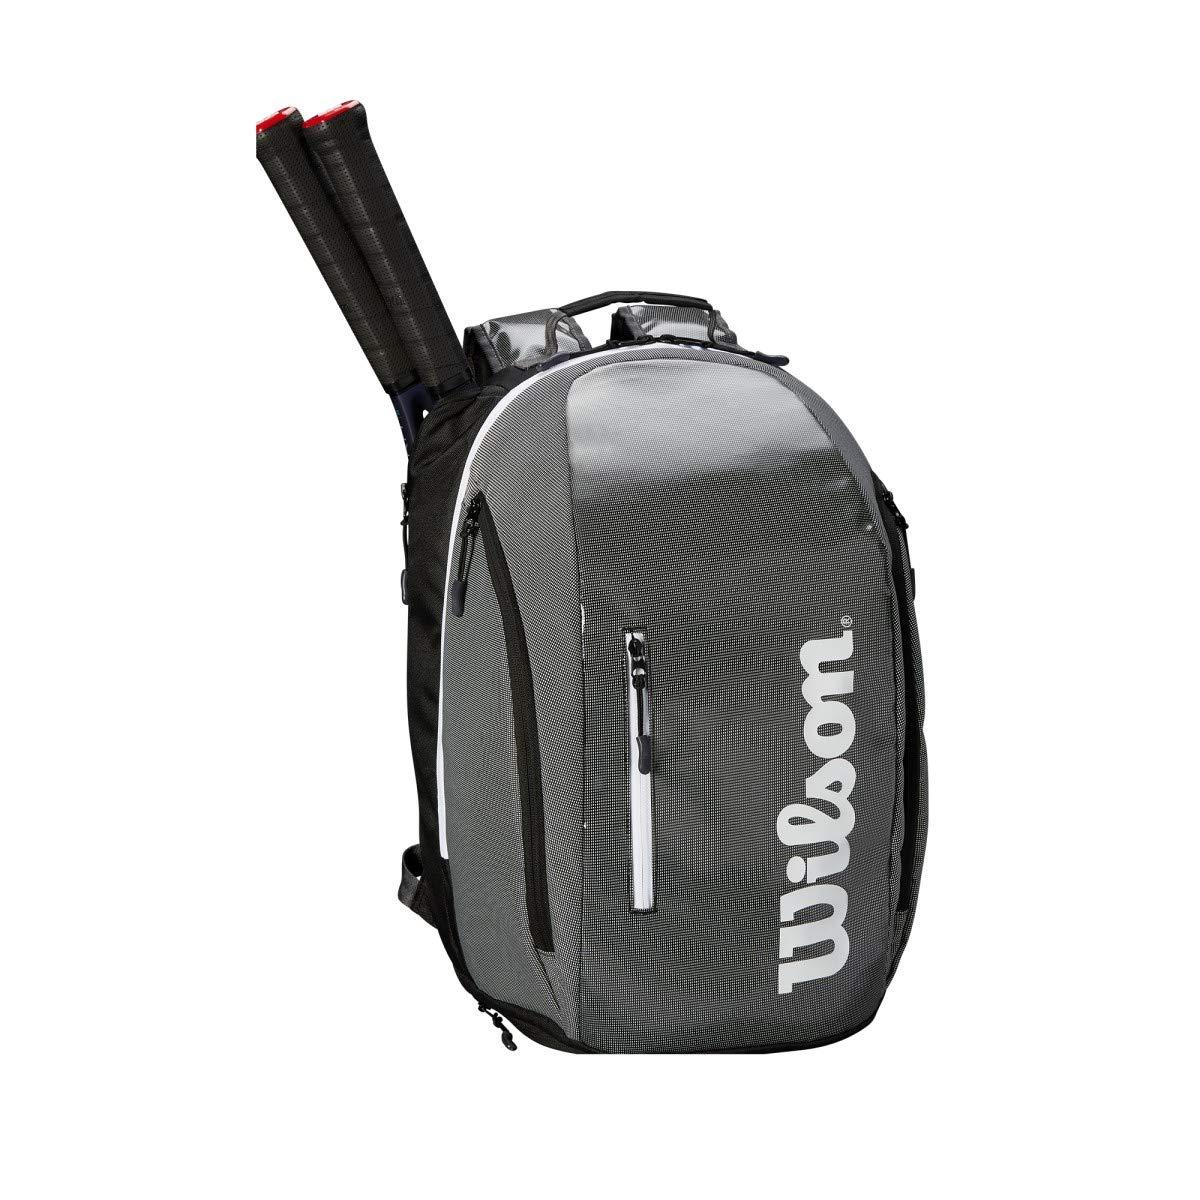 04ac9336c8 Amazon.com   Wilson Super Tour Tennis Bag Series   Sports   Outdoors